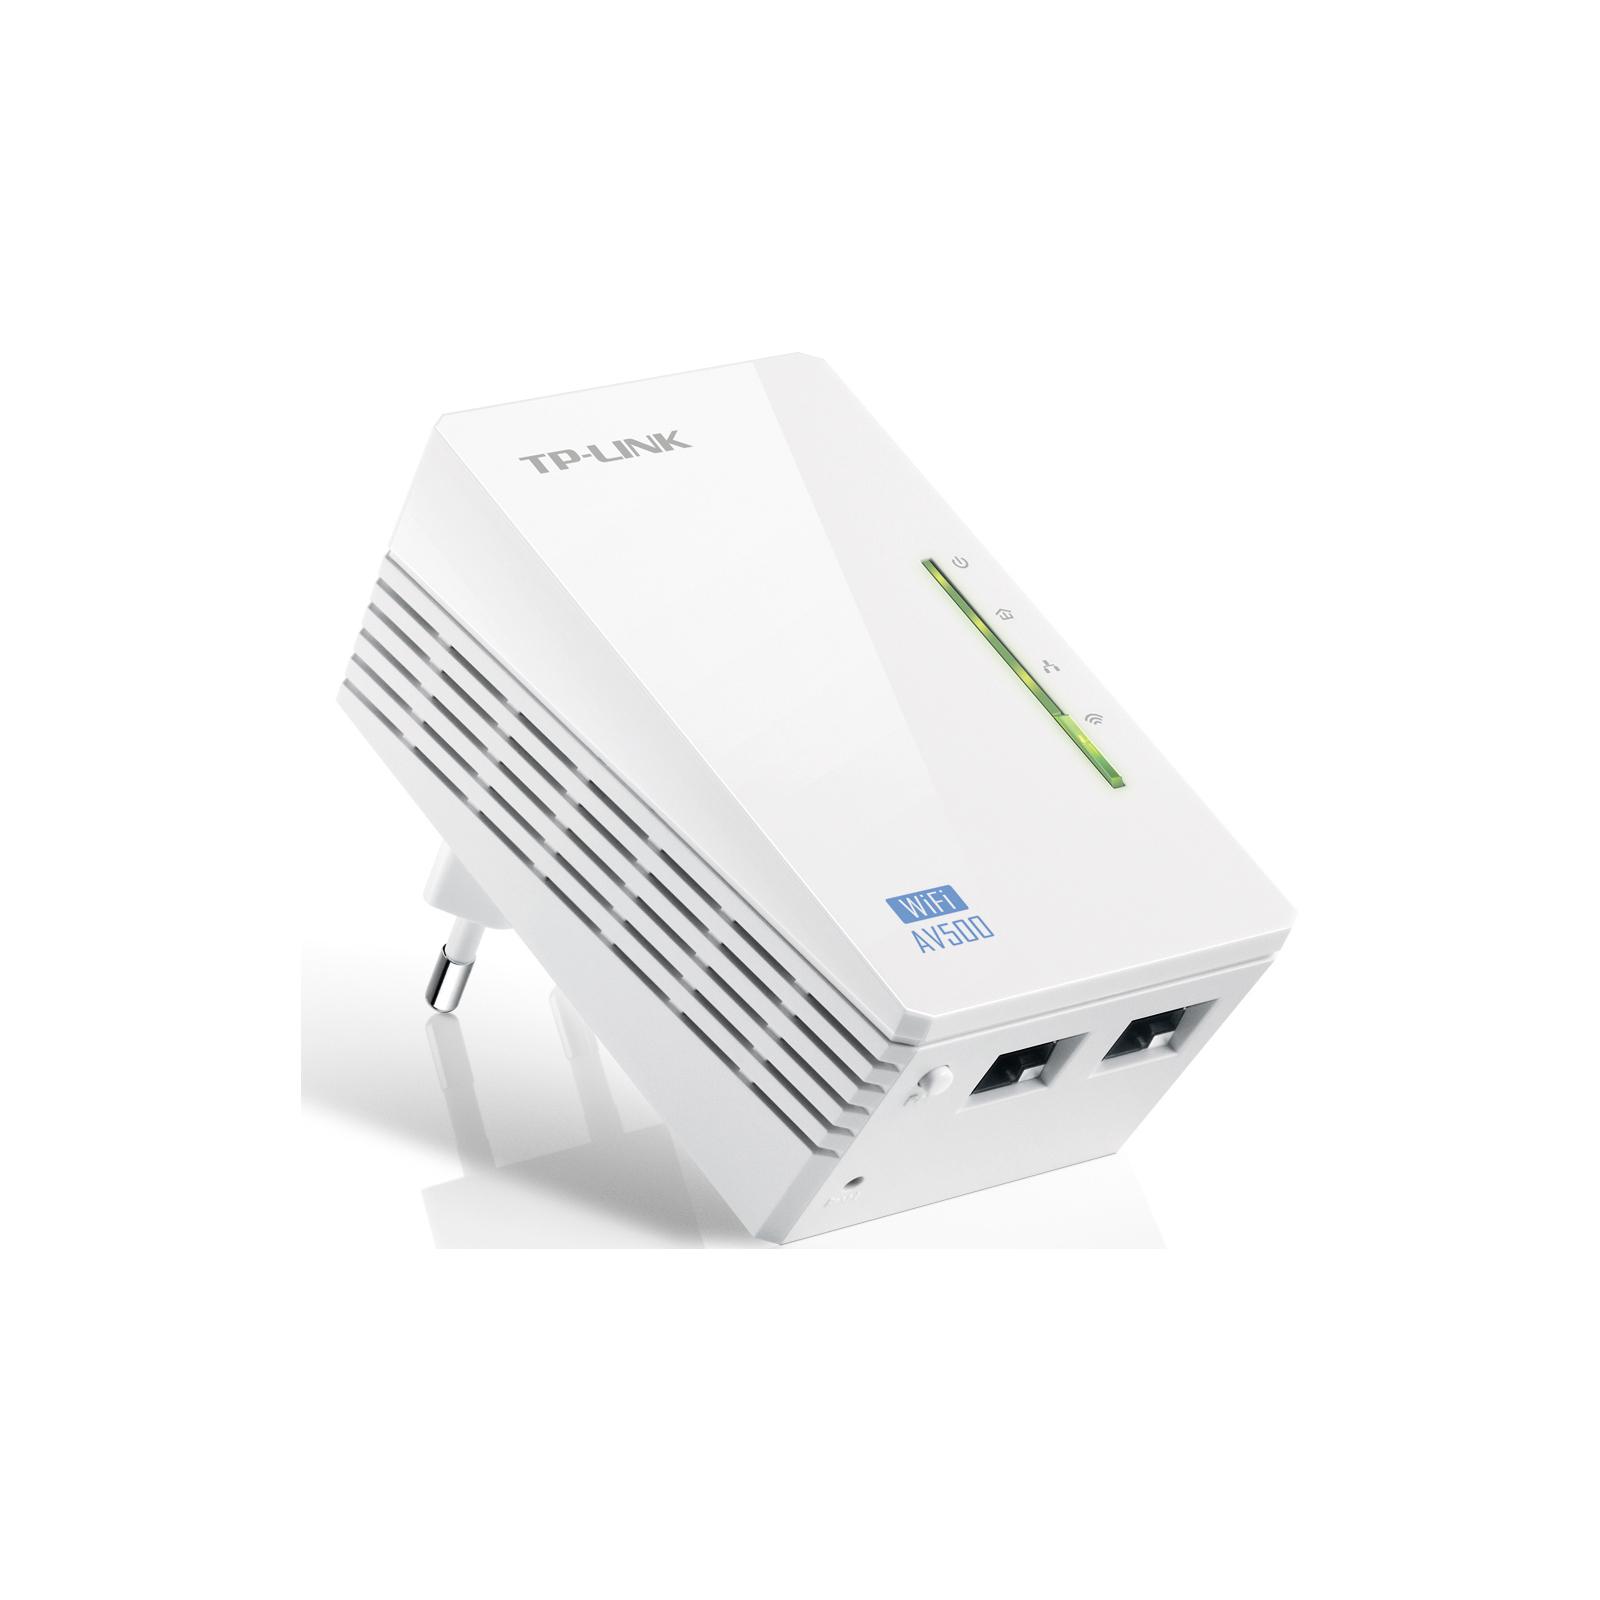 Адаптер Powerline TP-Link TL-WPA4220 изображение 4